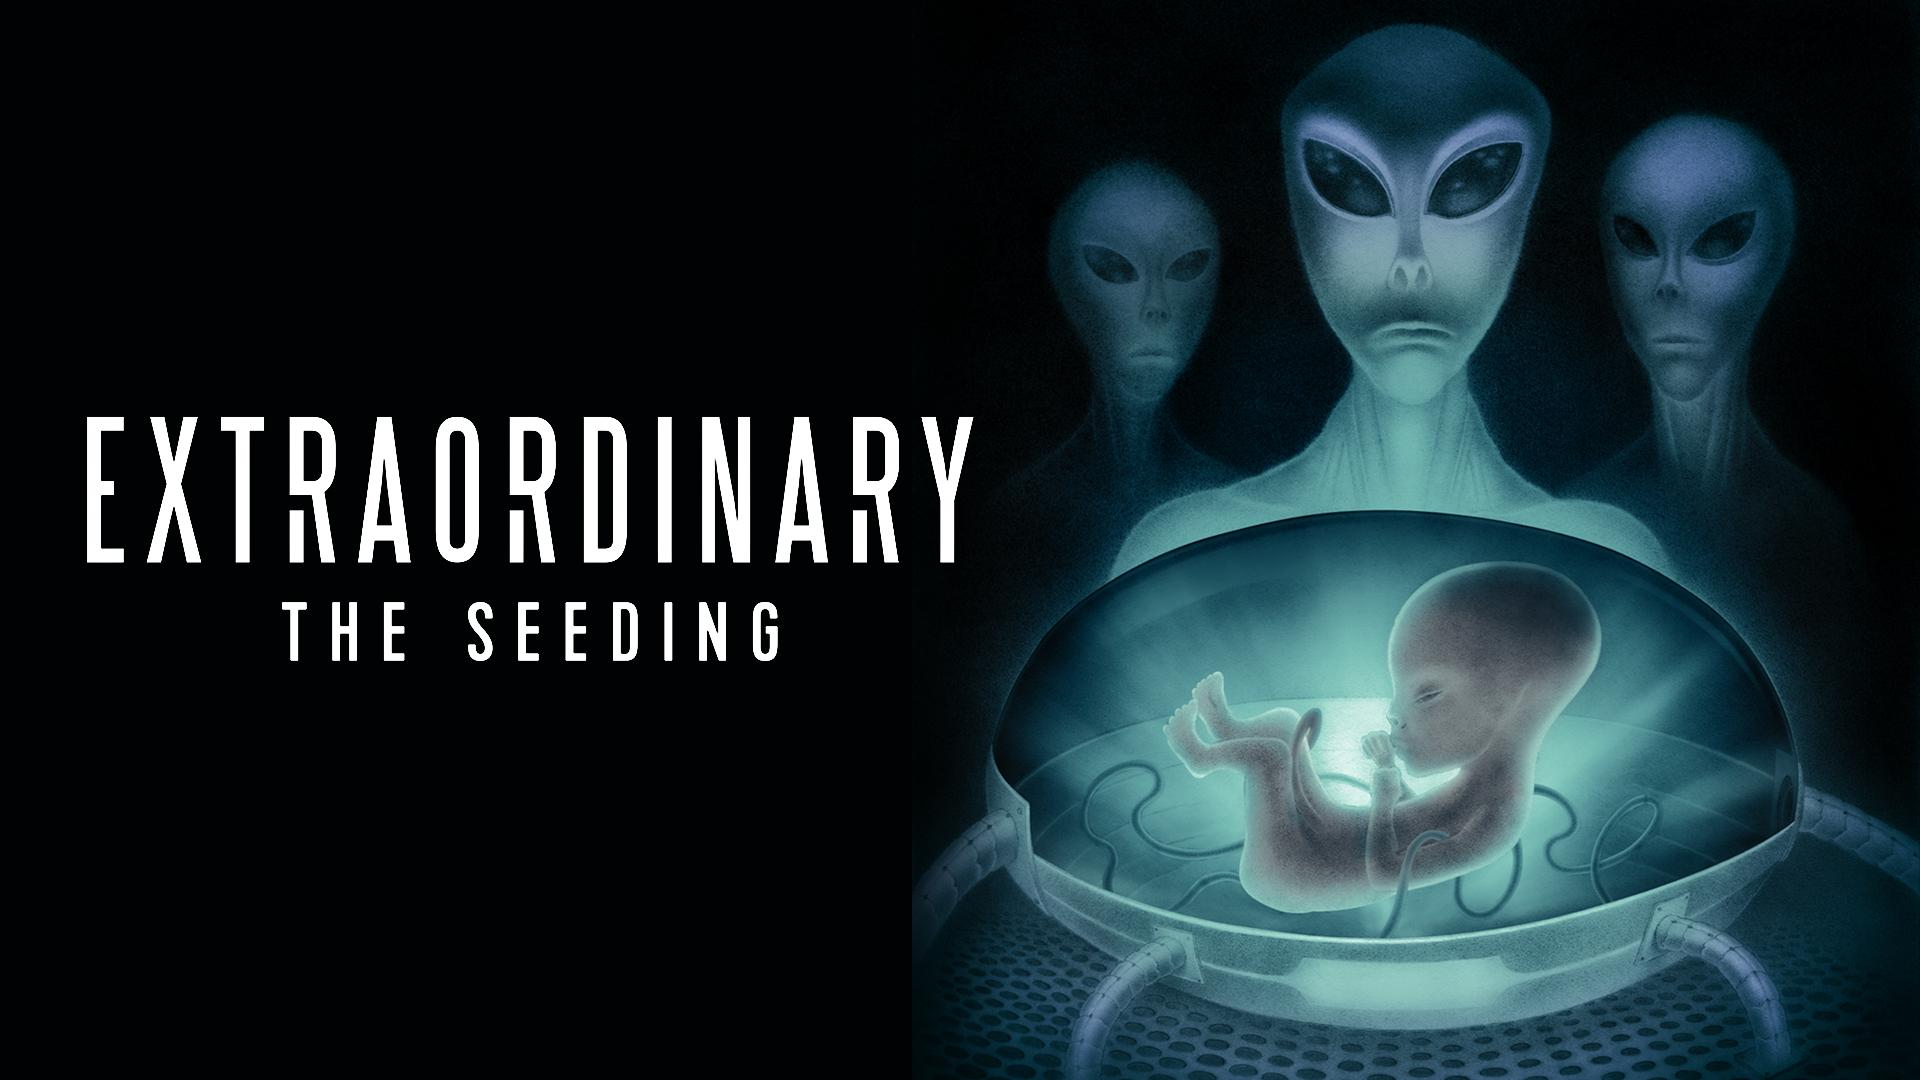 Extraordinary: The Seeding